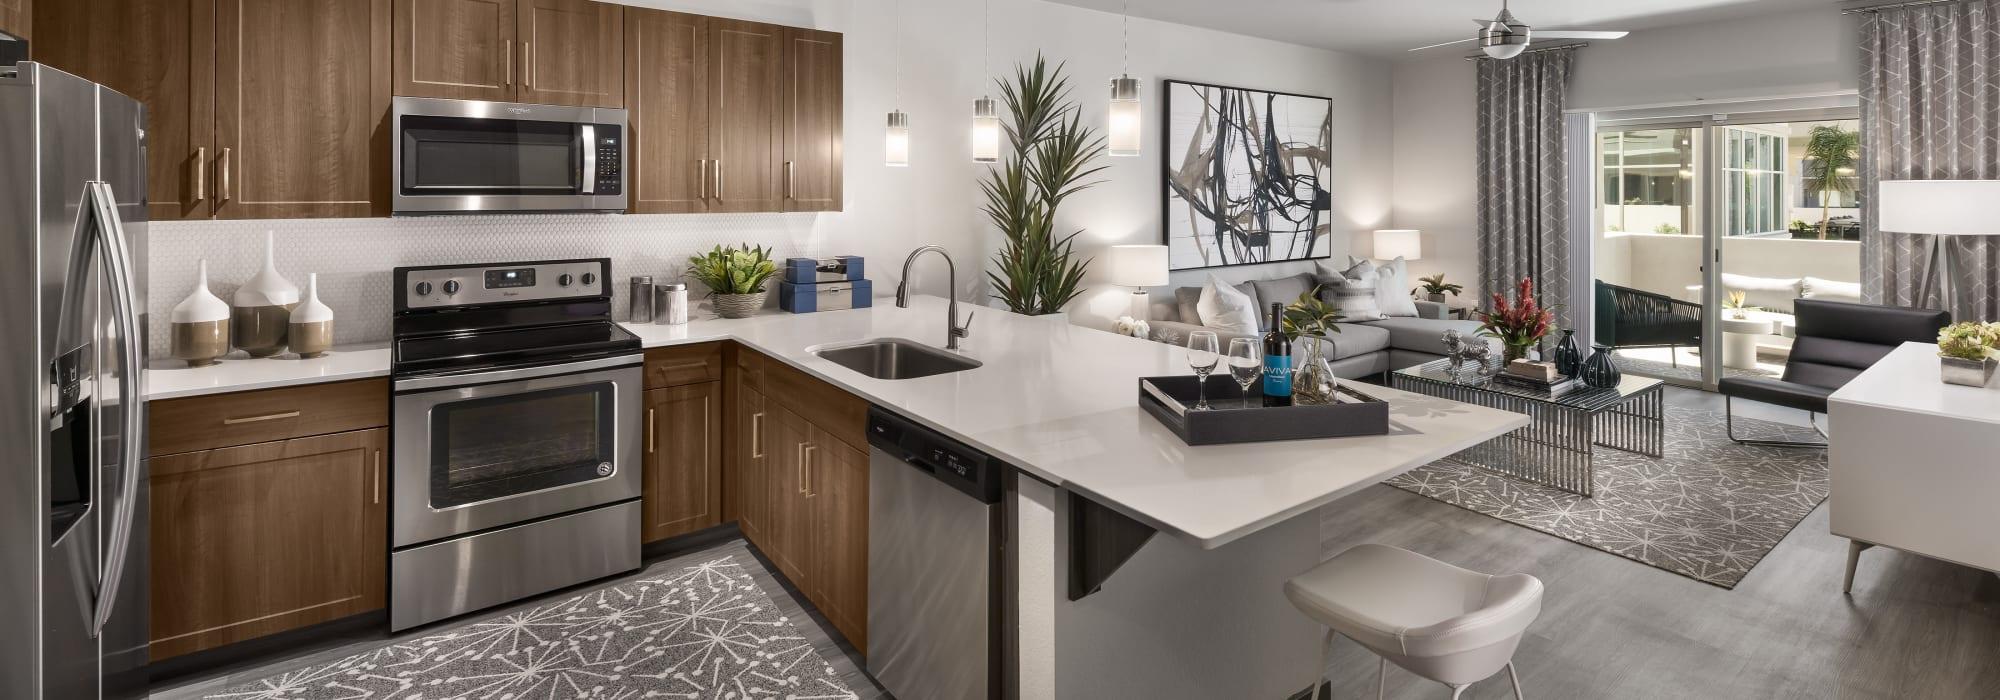 Luxury Apartments for Rent in East Mesa AZ  Aviva